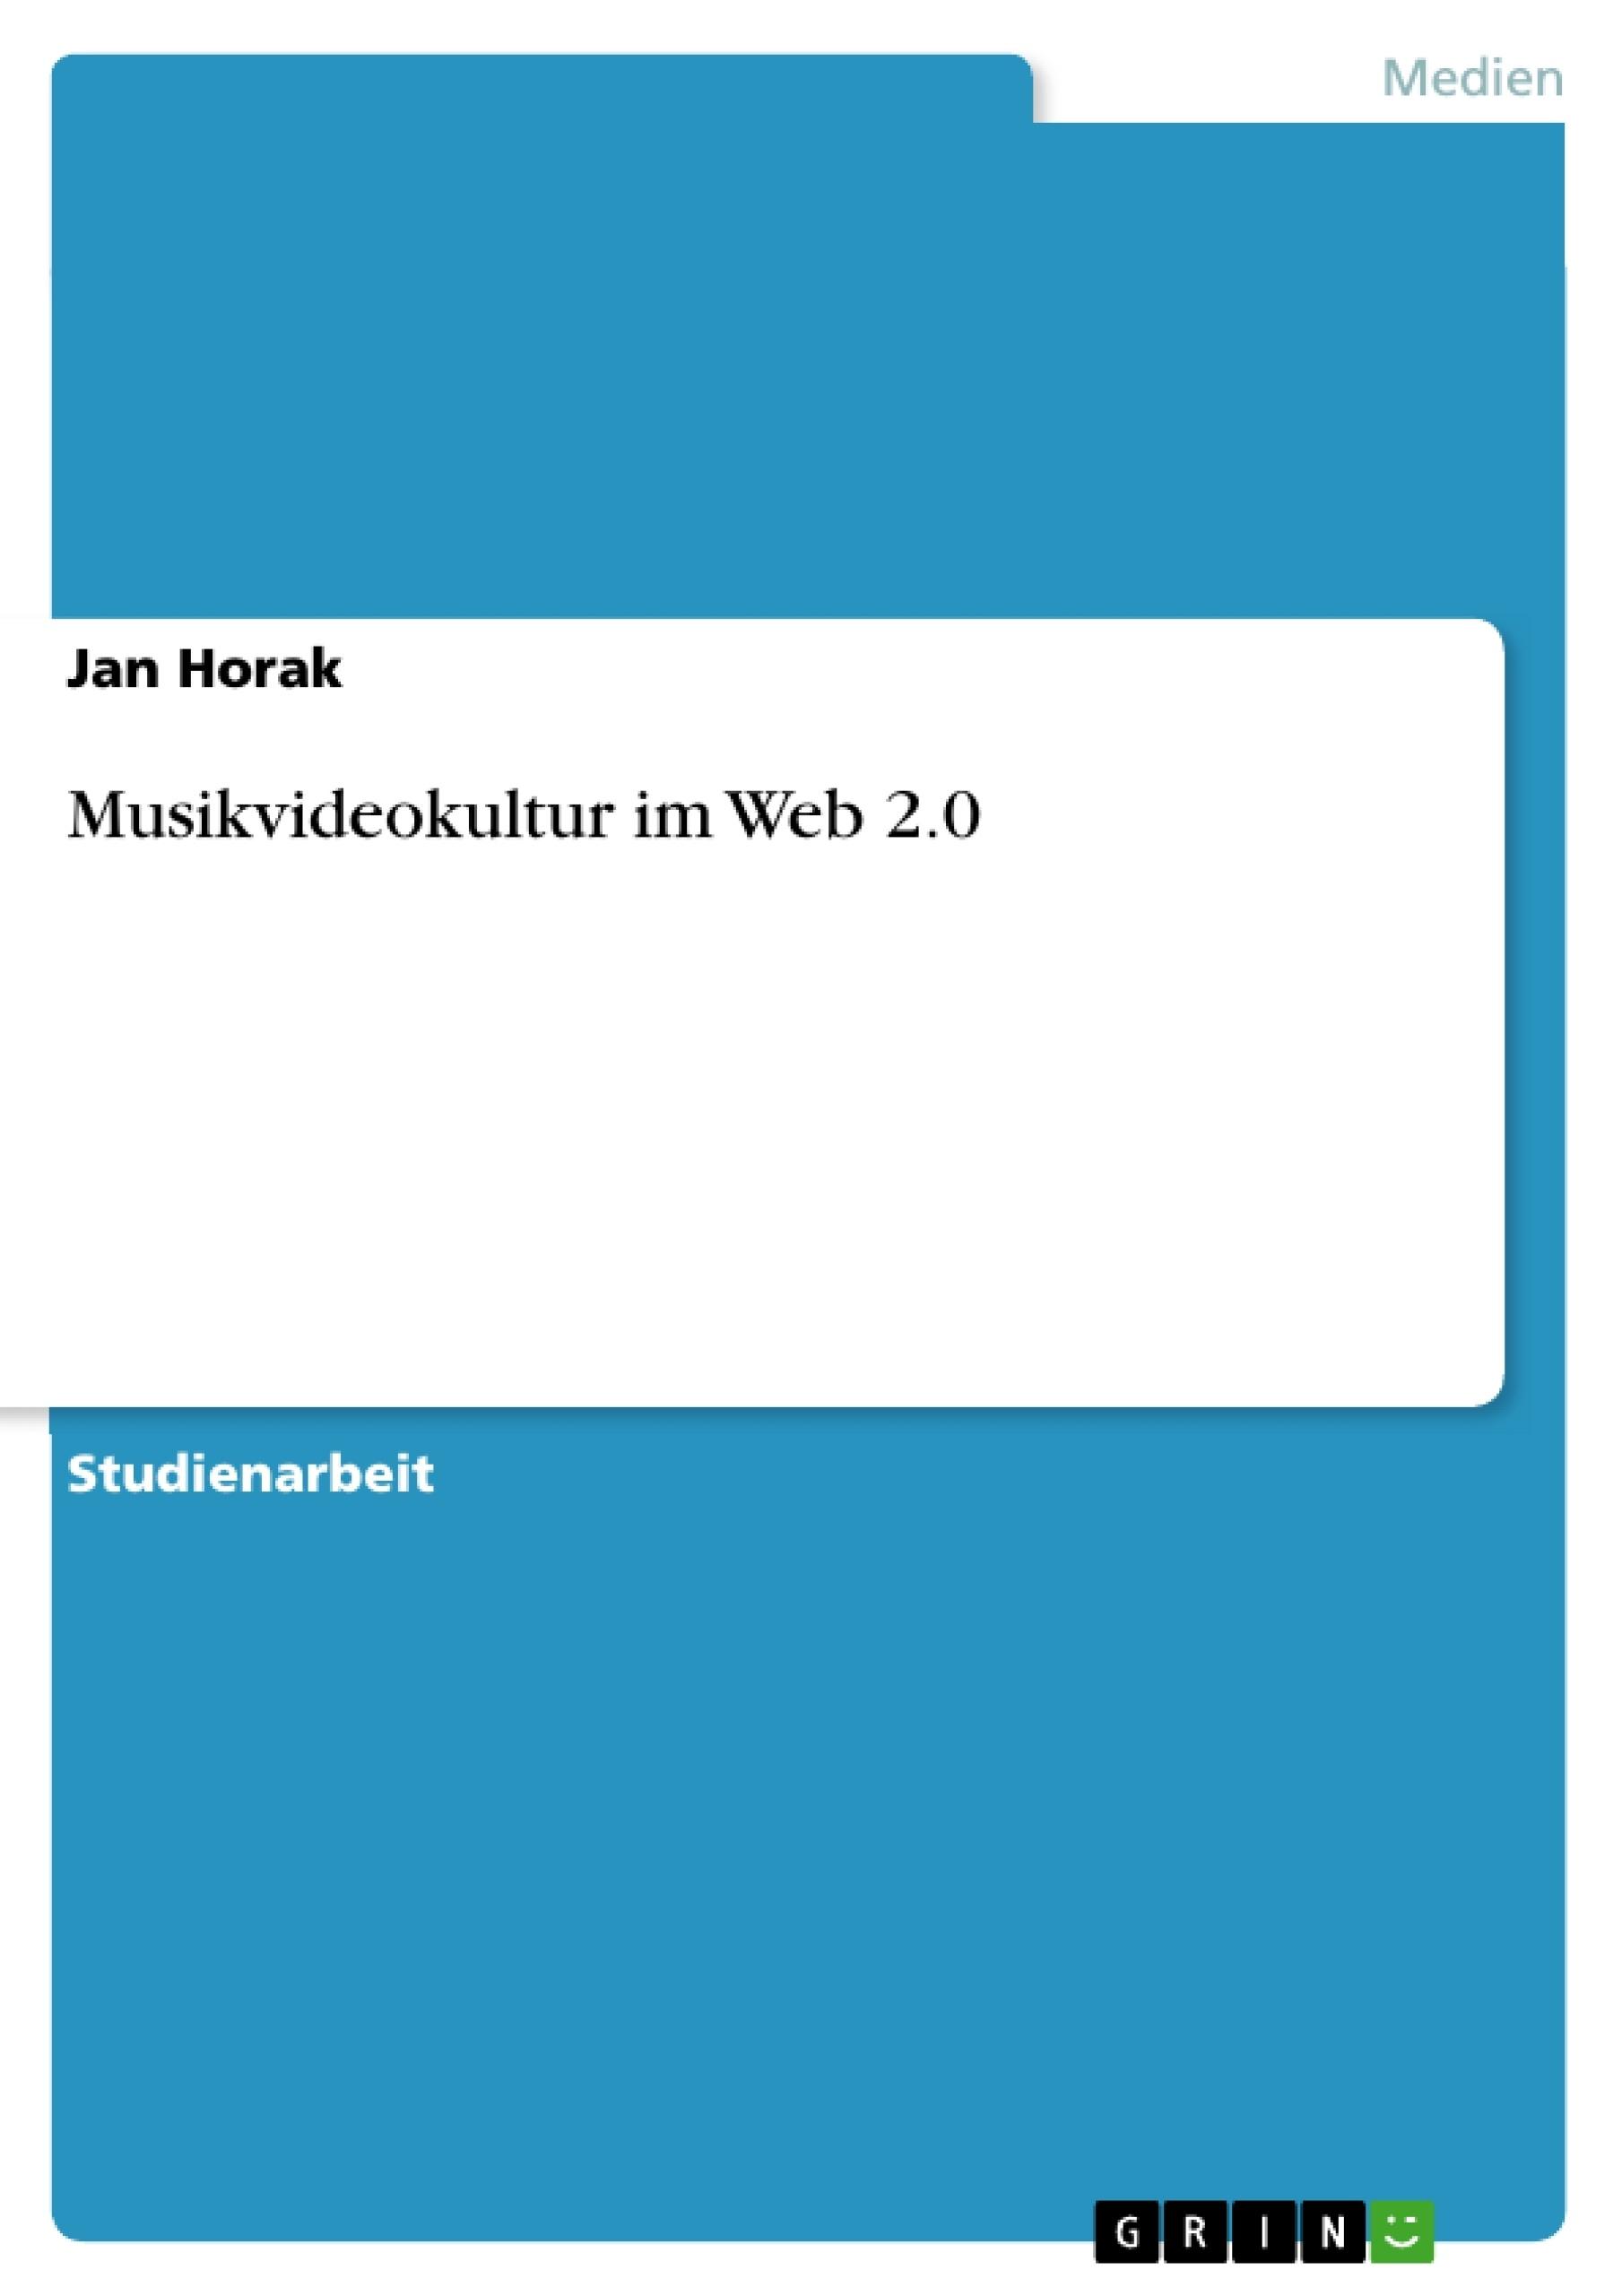 Titel: Musikvideokultur im Web 2.0